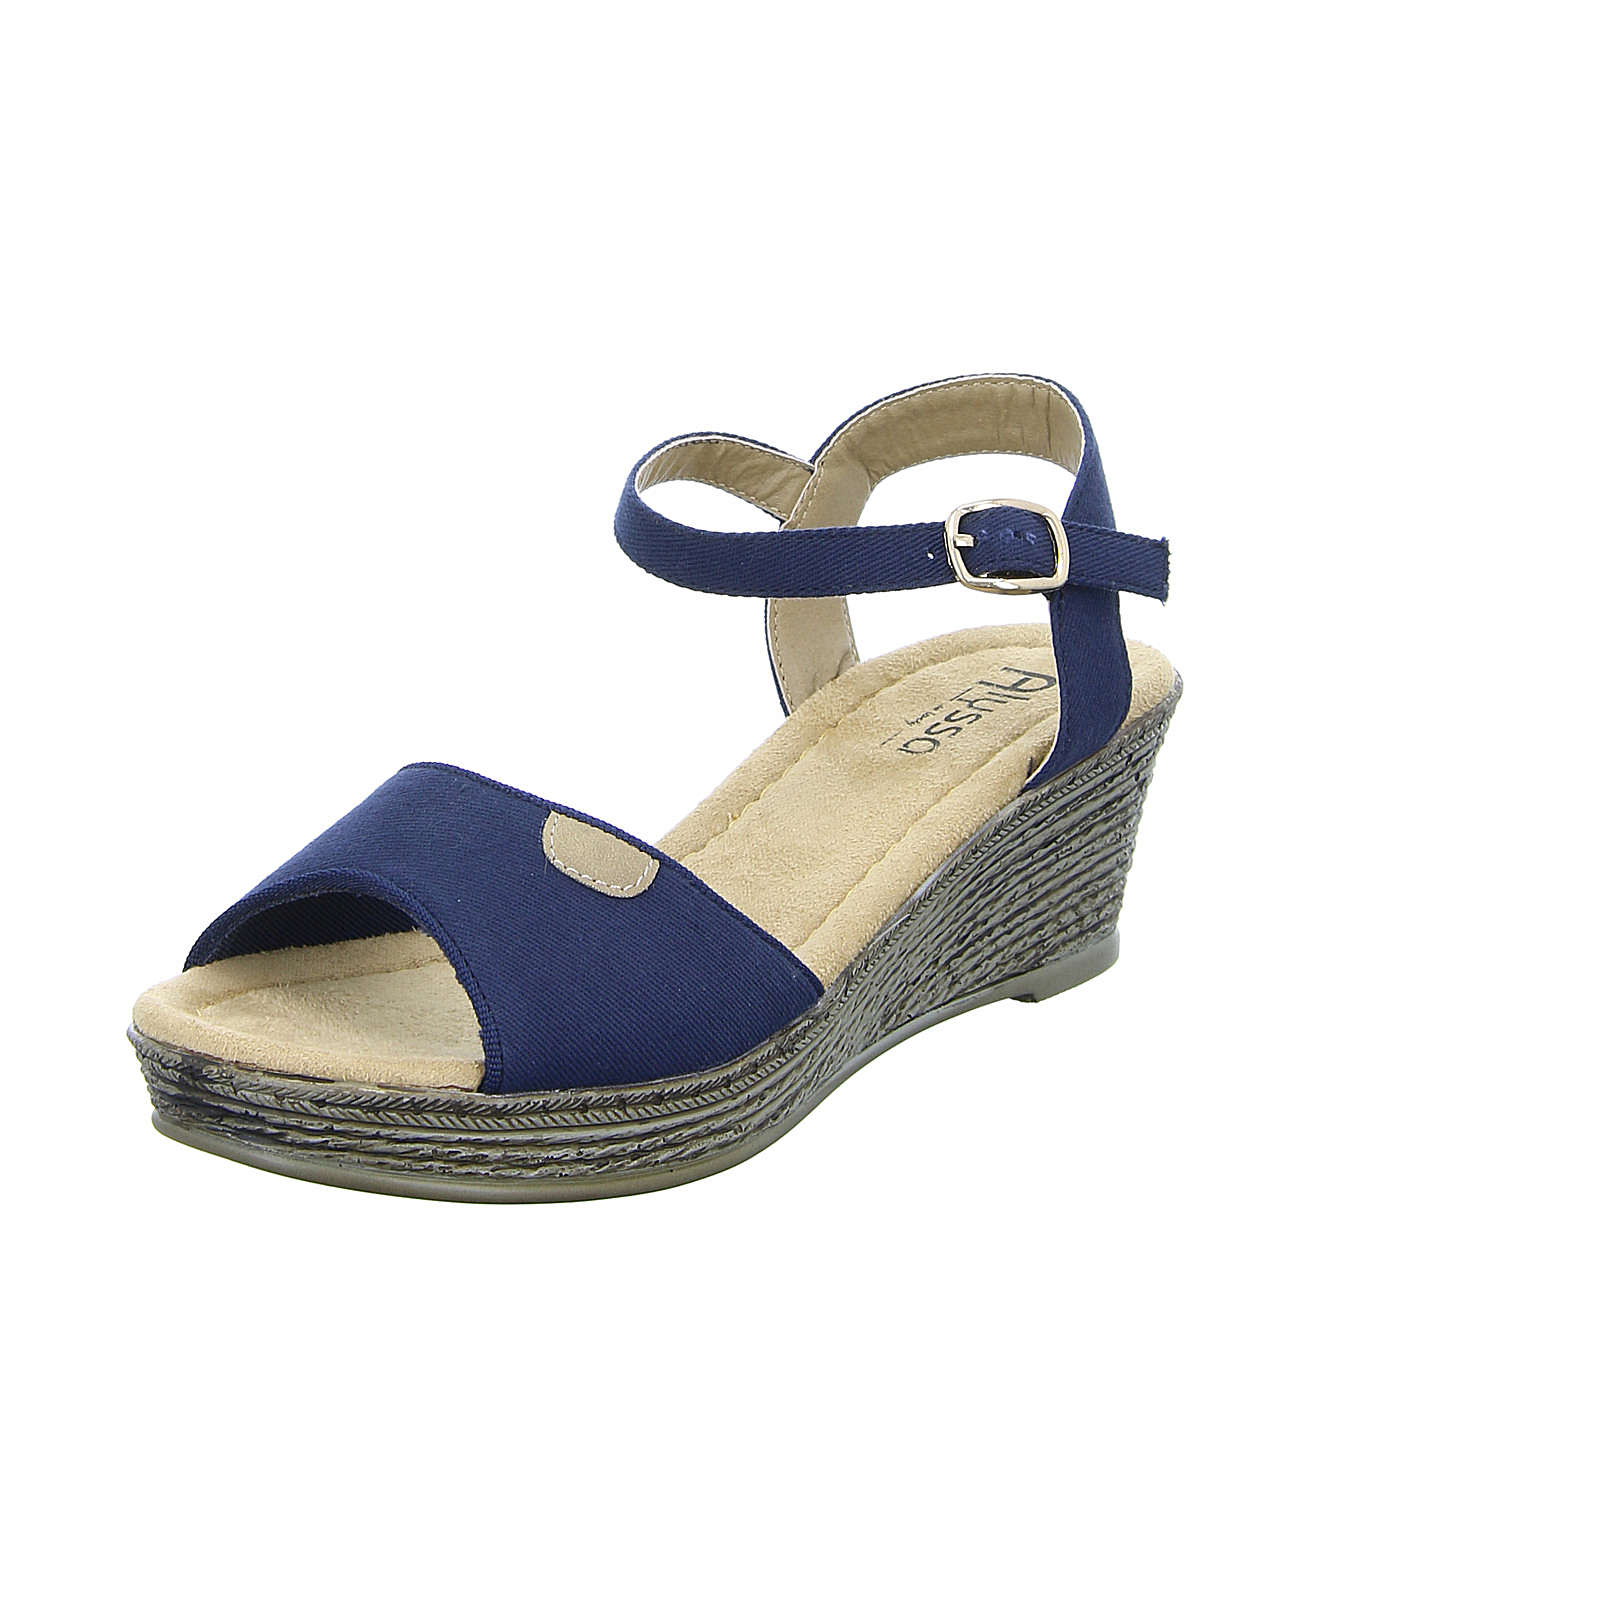 Alyssa Damen Sandalette A687-83 blau Damen Gr. 41